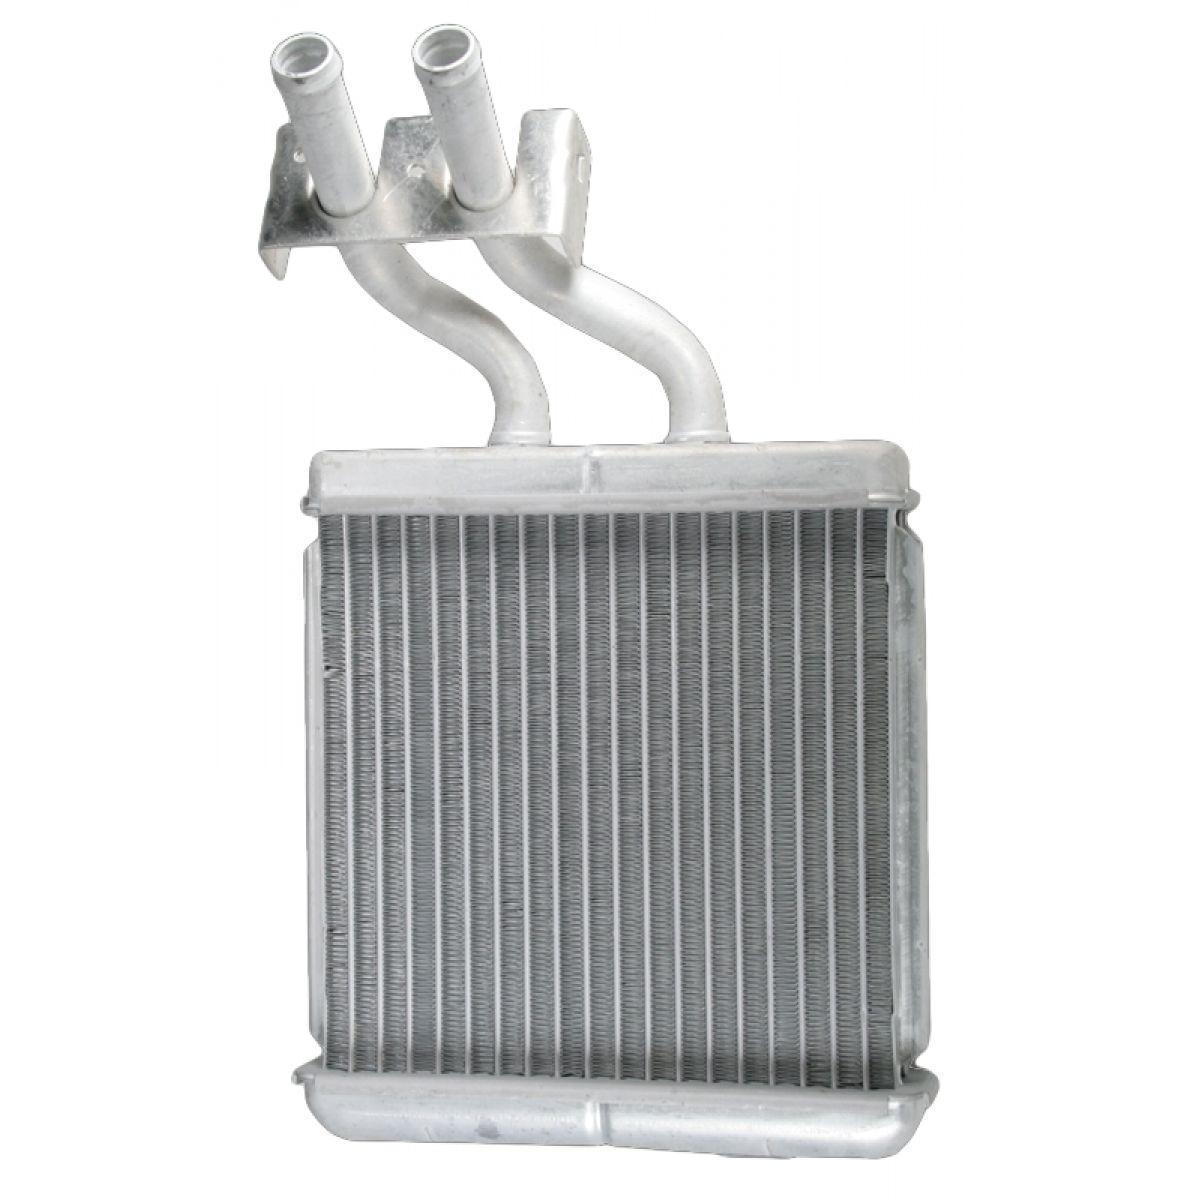 Am on 99 Dakota Heater Core Replacement